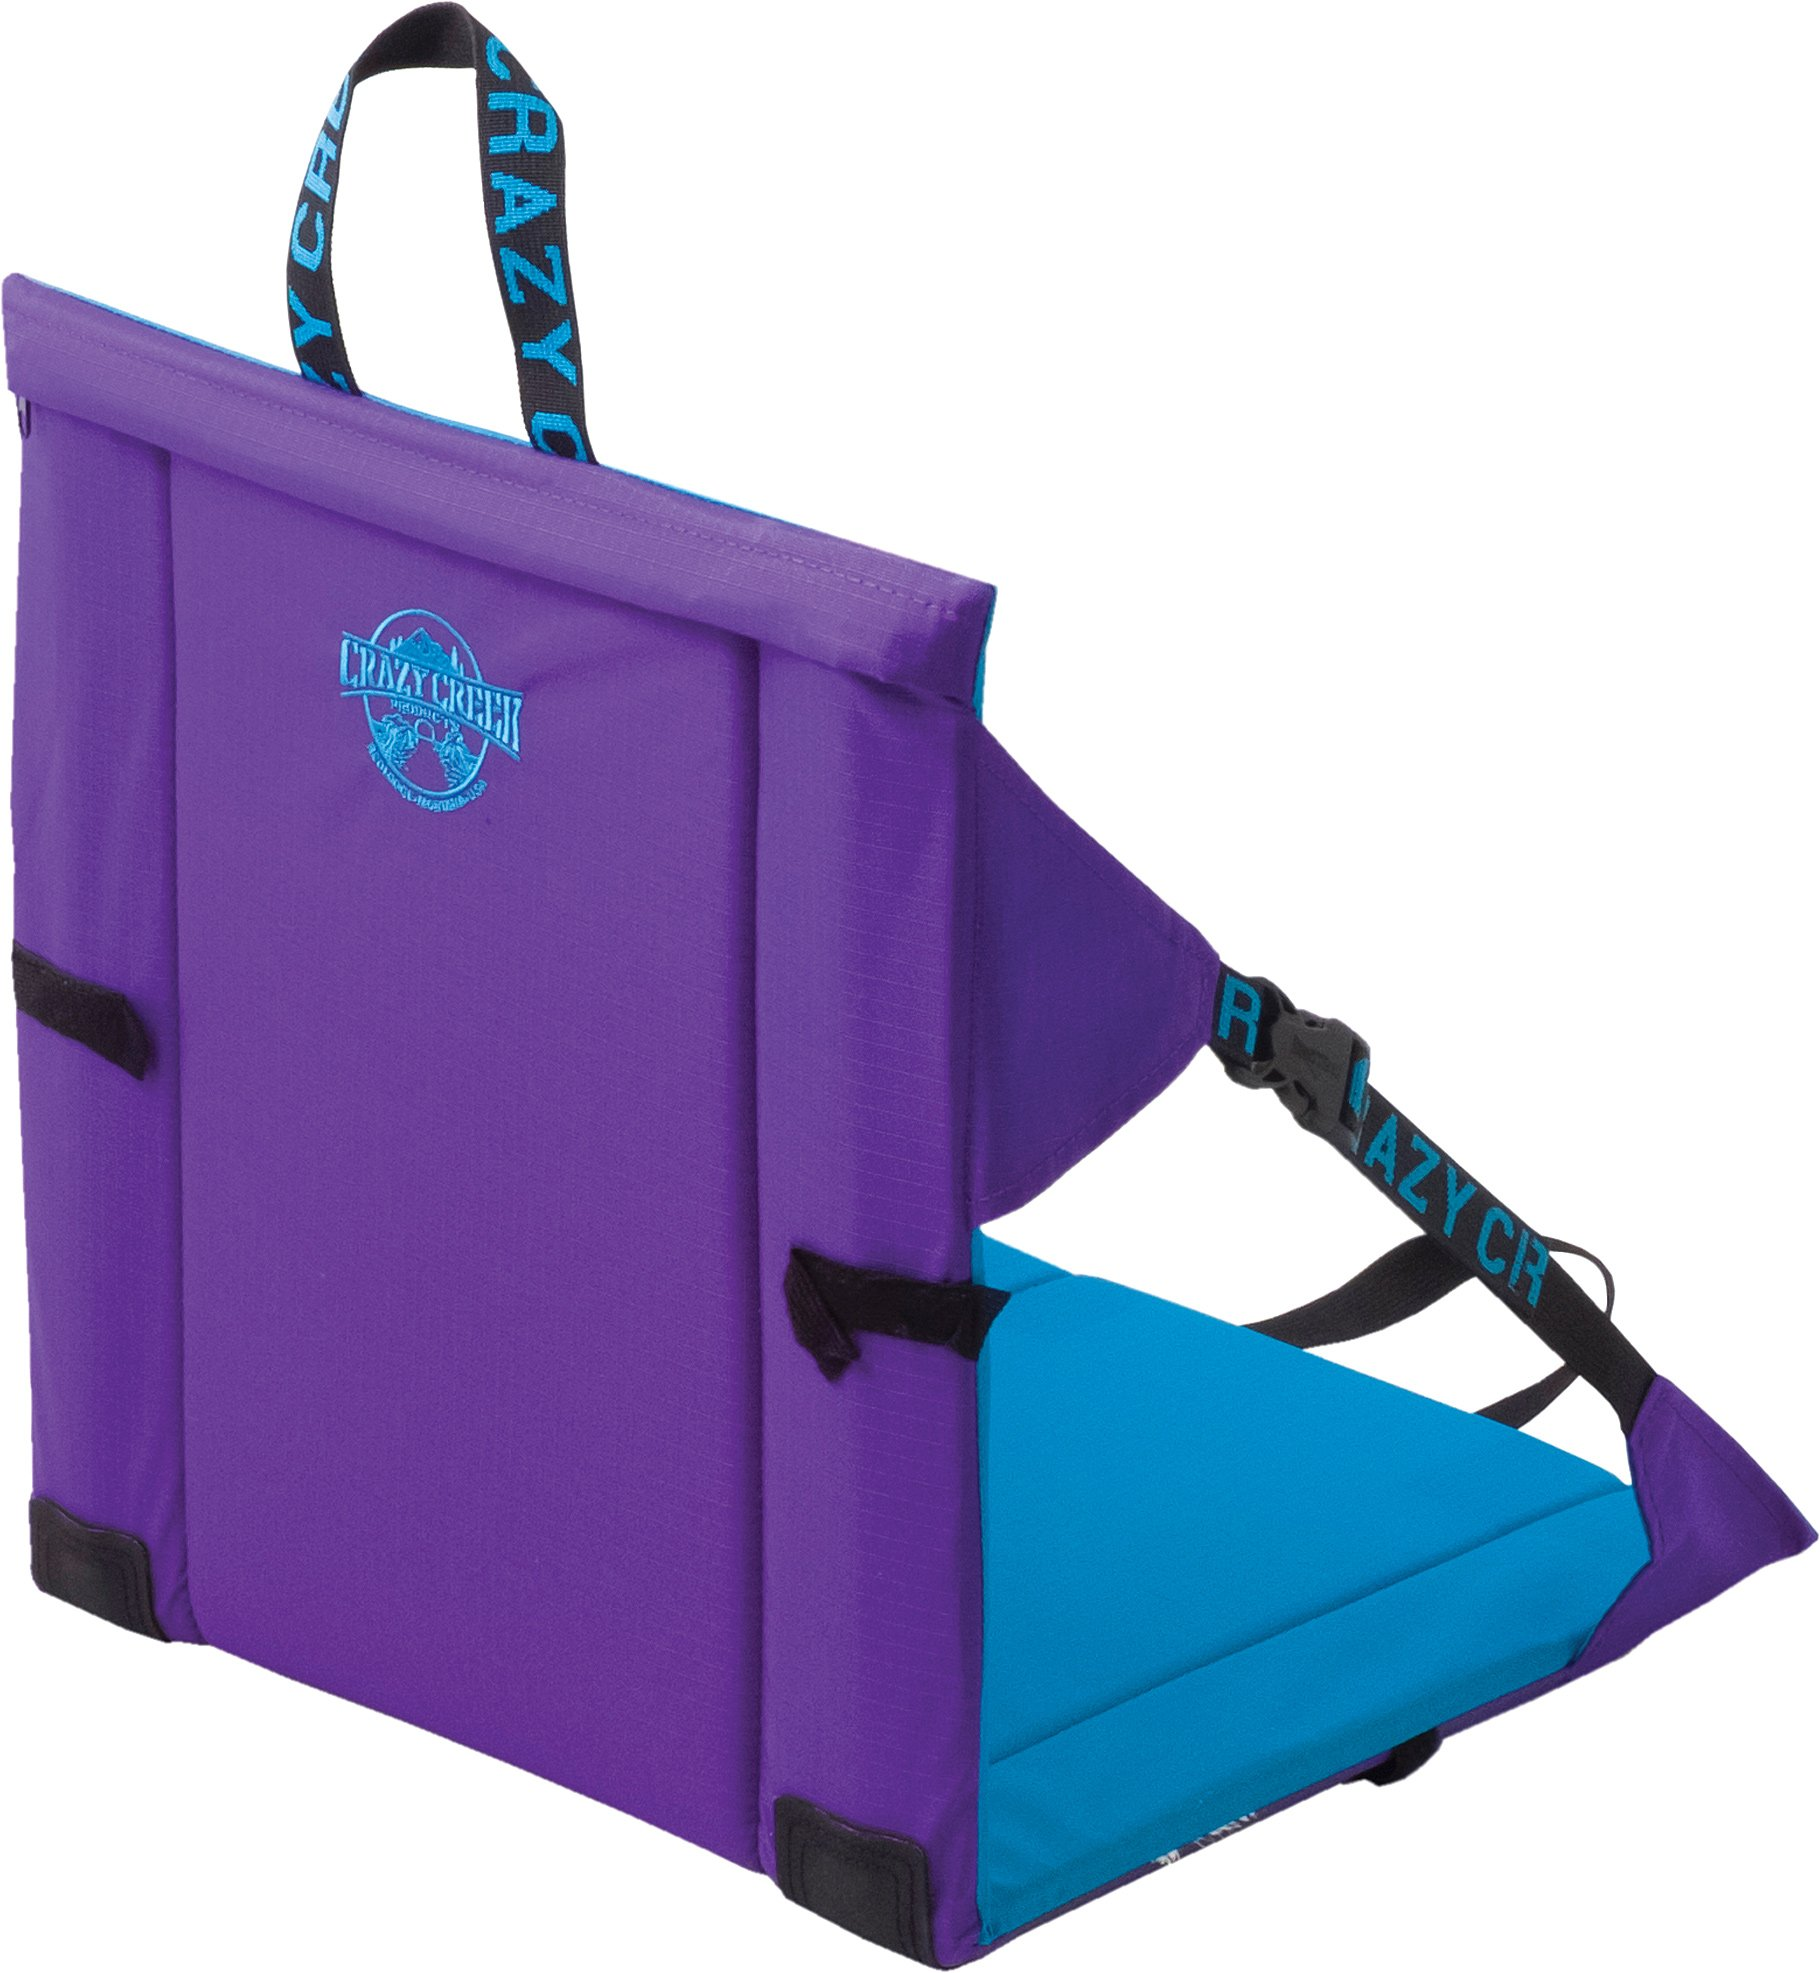 Crazy Creek Original Chair - The Original Lightweight Padded Folding Chair - Purple/Teal